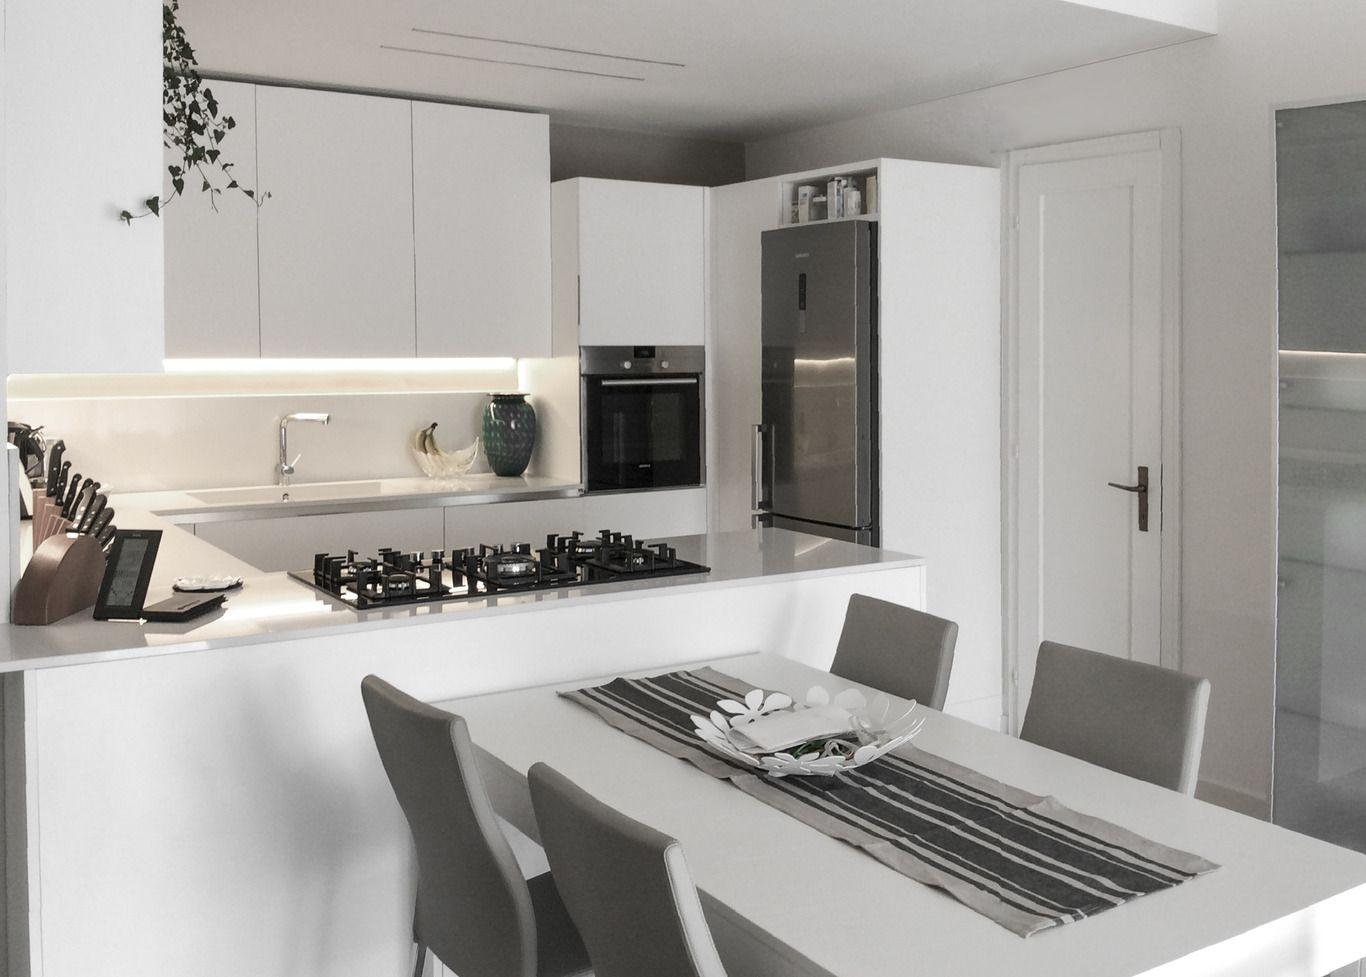 La cucina Start-Time.Go di Lisa | Veneta Cucine | Idee casa ...